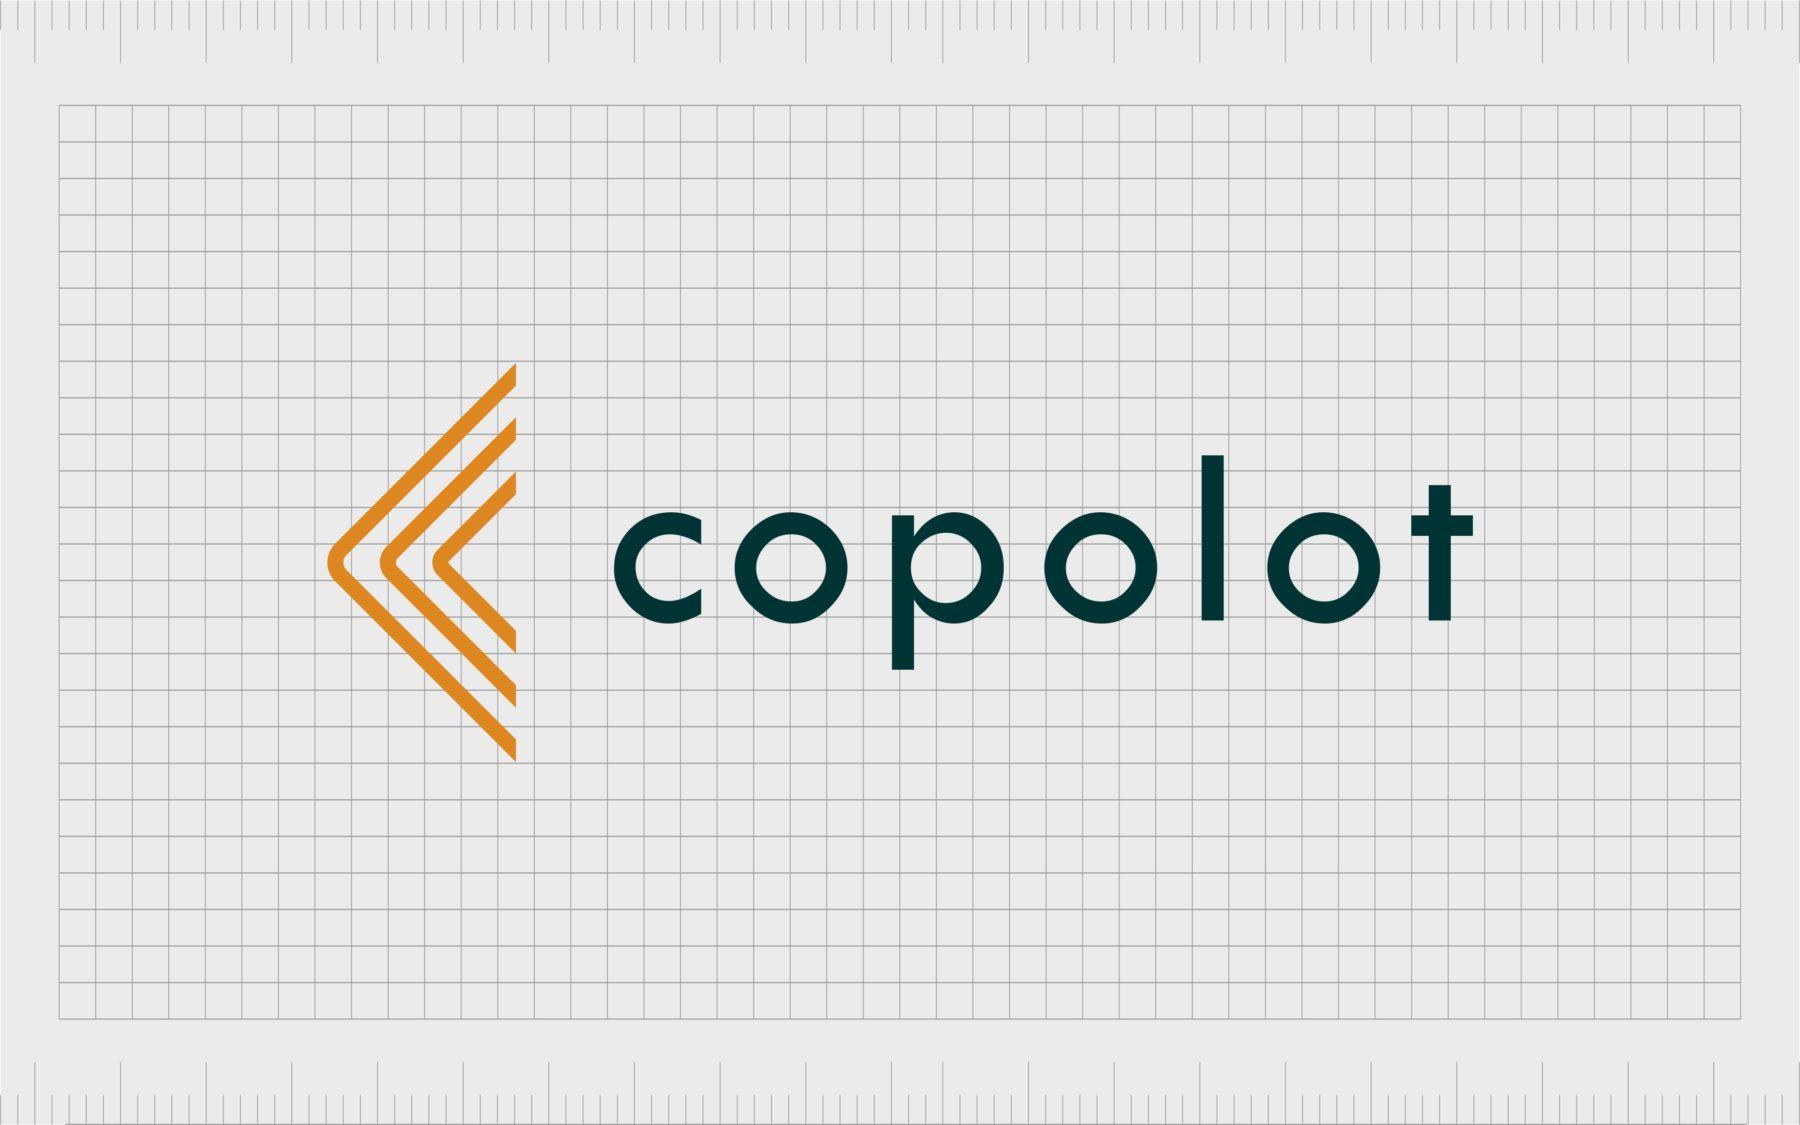 Copolot